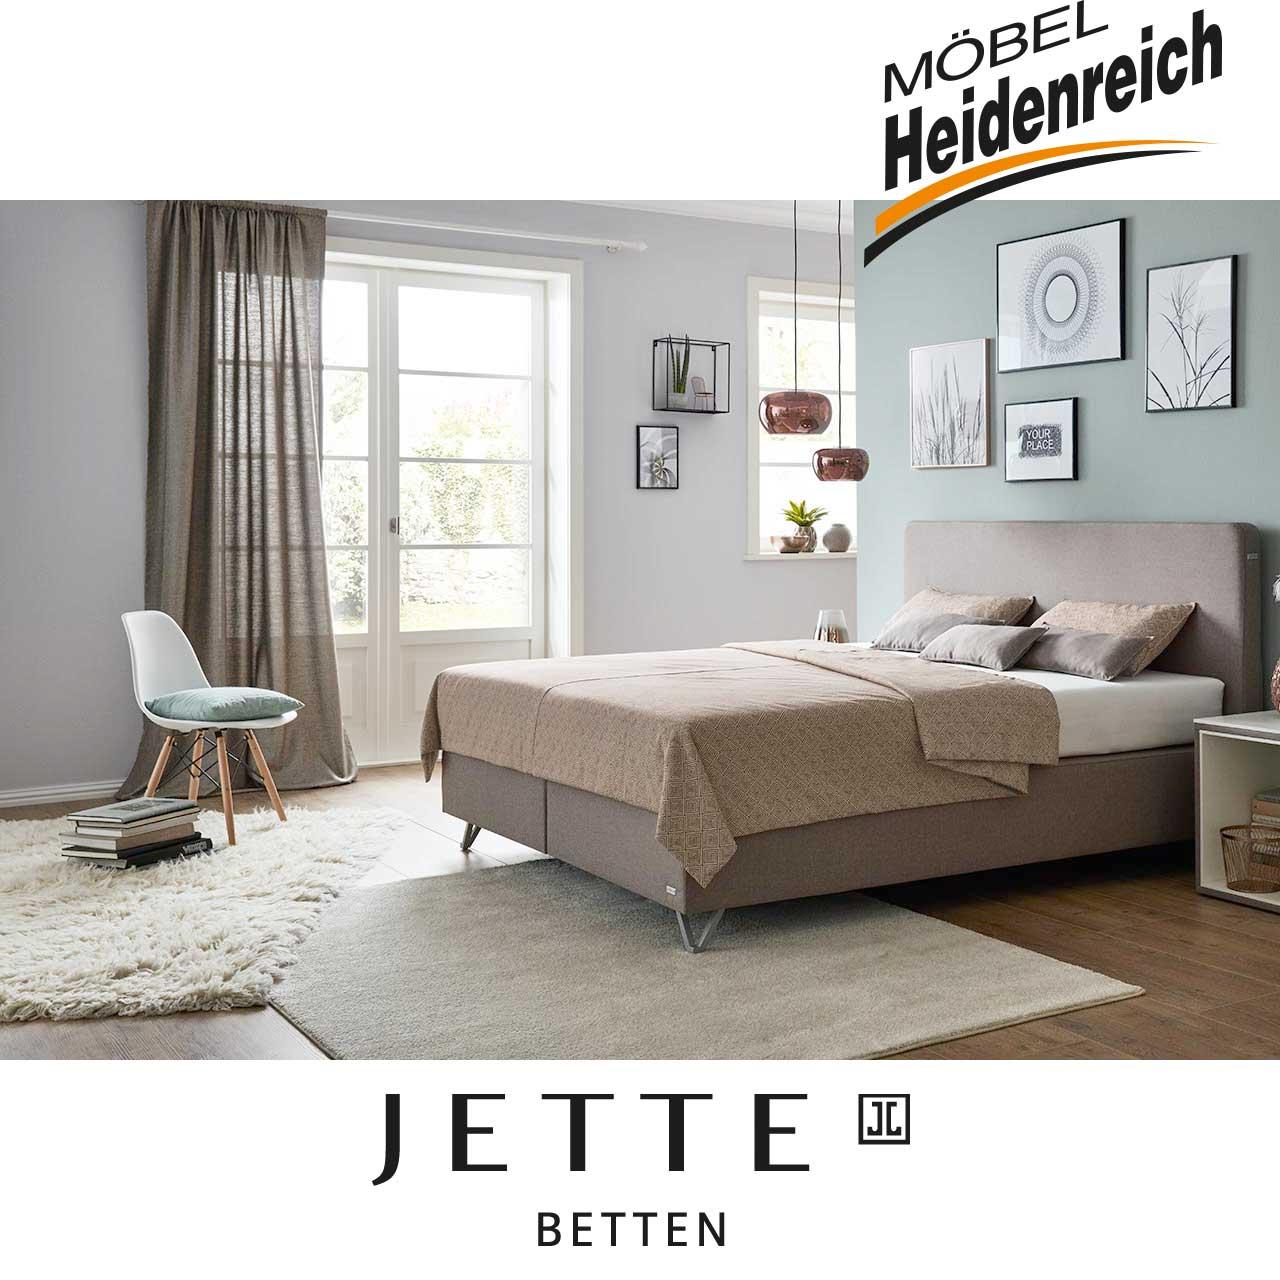 Full Size of Polsterbett 200x220 Boxspringbett Jette Betten 101 Mbel Heidenreich Bett Wohnzimmer Polsterbett 200x220